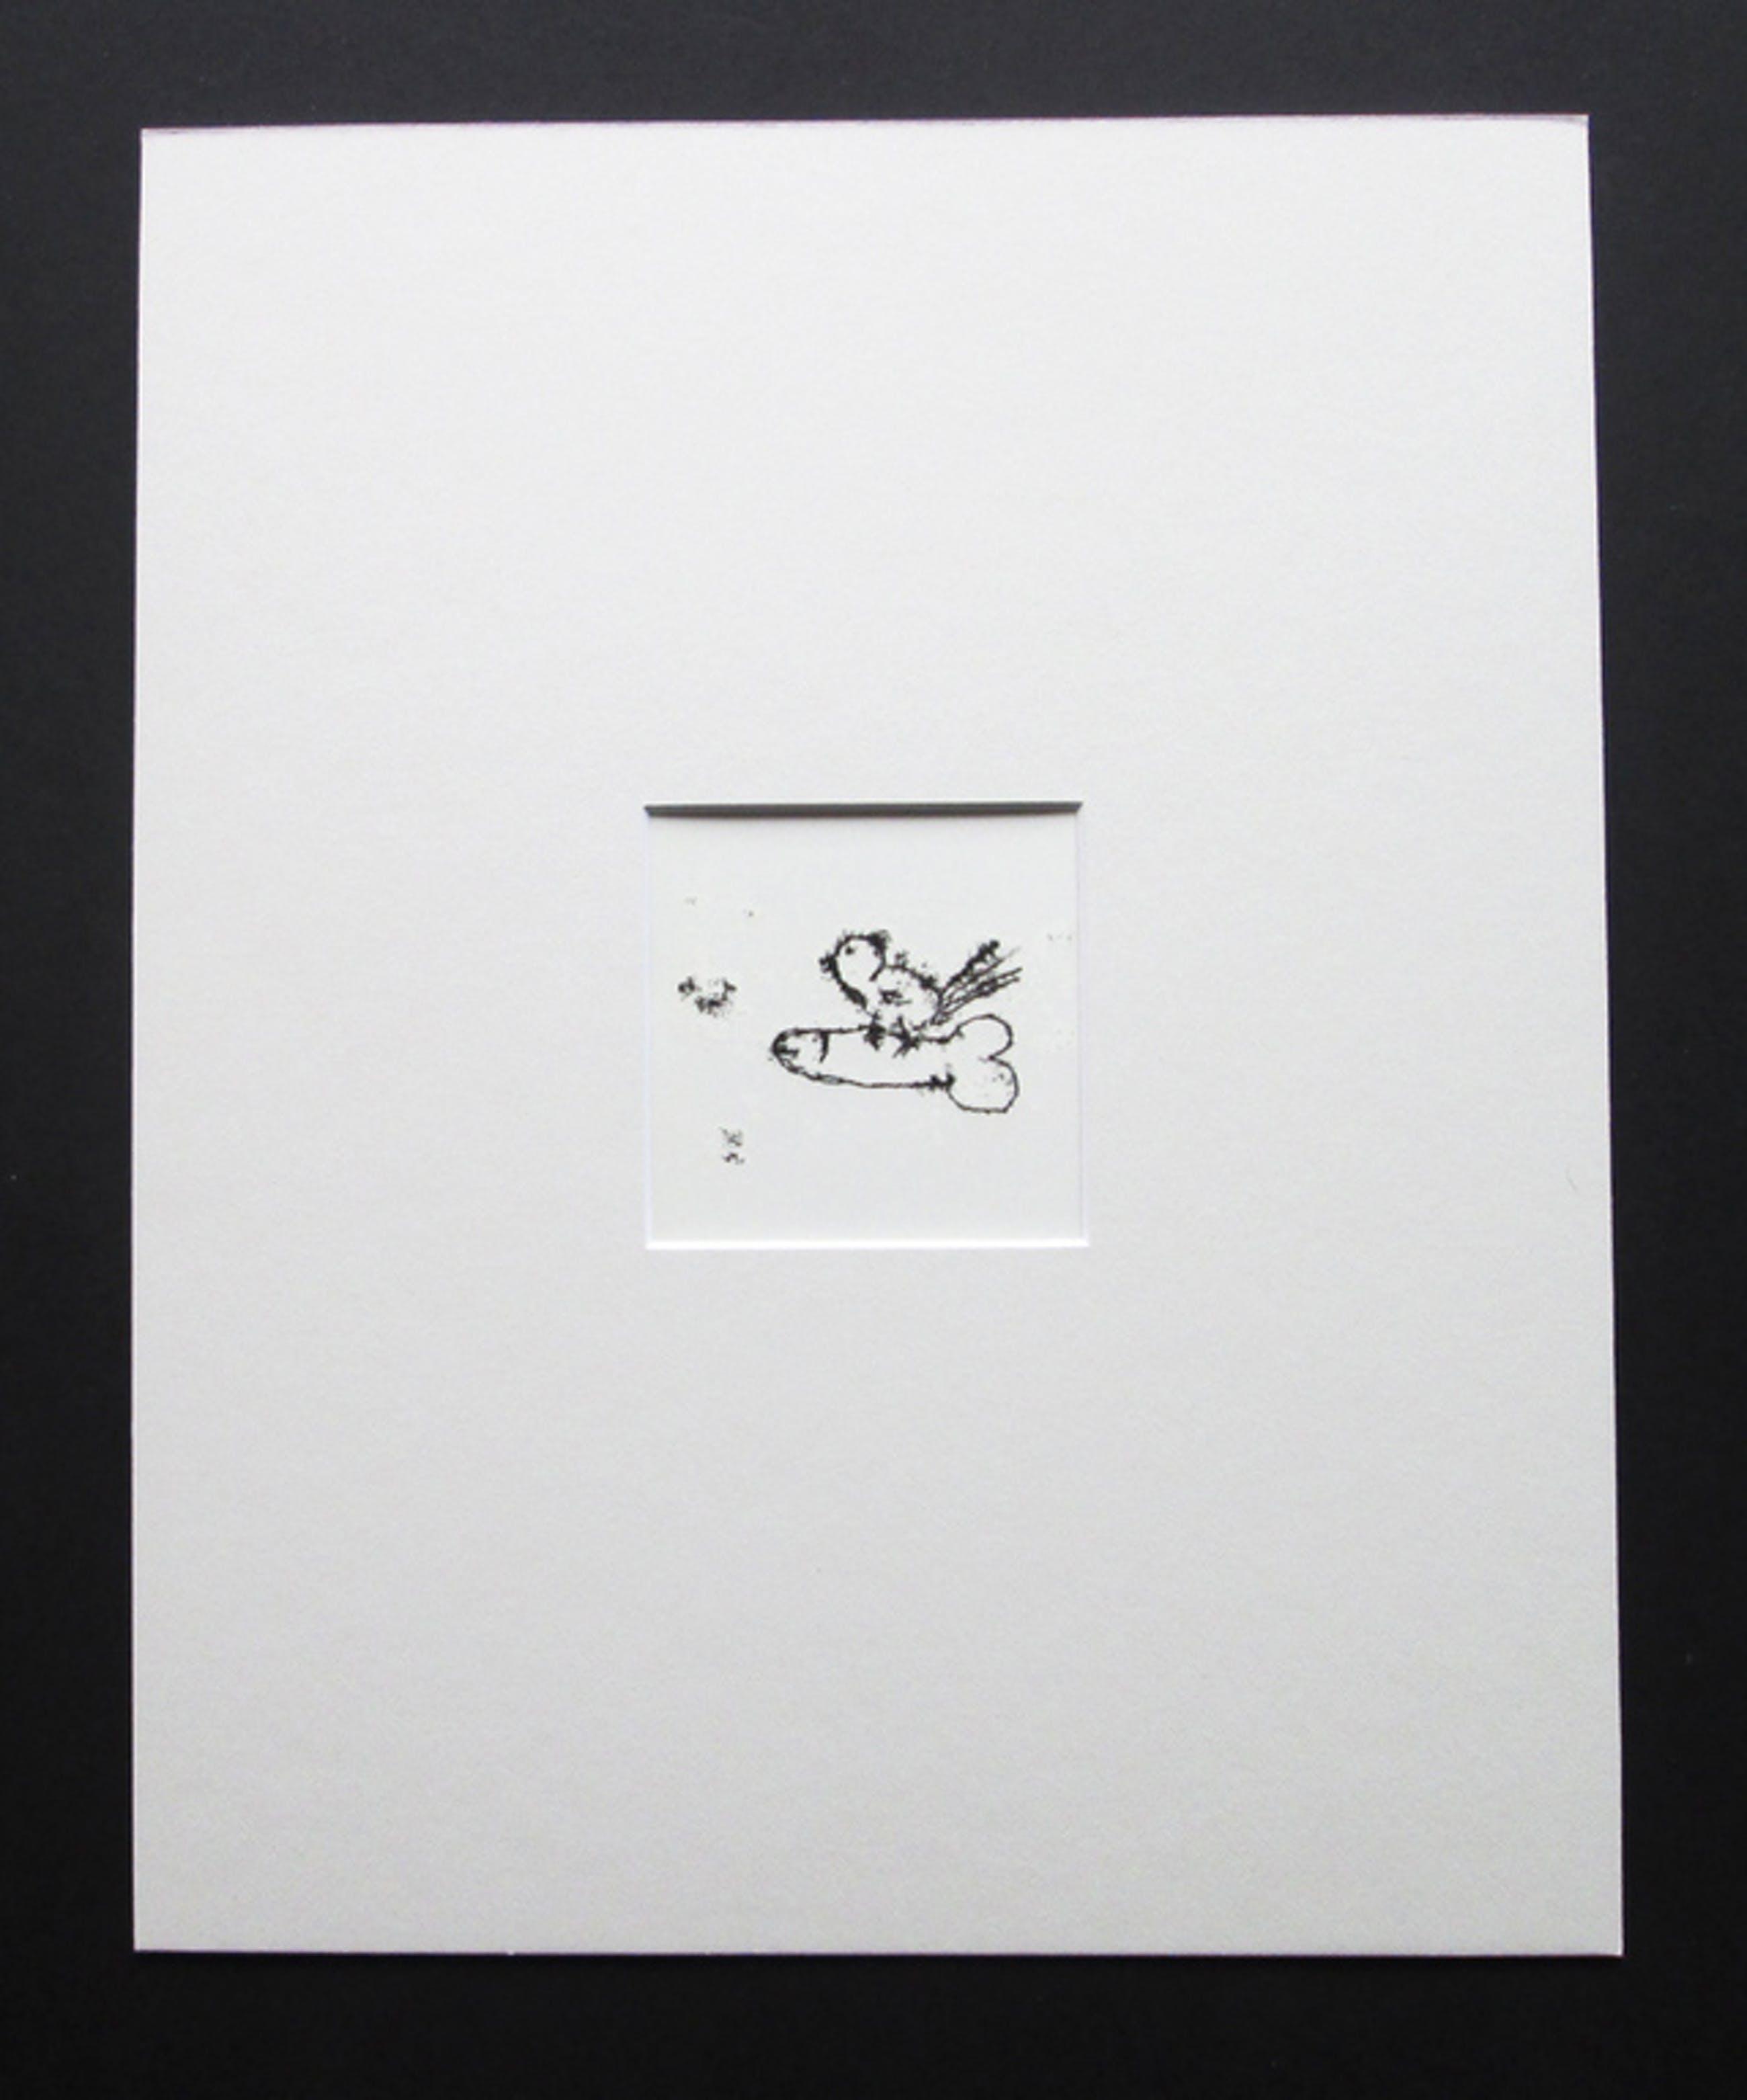 Biennale 2007 - Singing Bird - Tracey Emin, in passe-partout kopen? Bied vanaf 25!